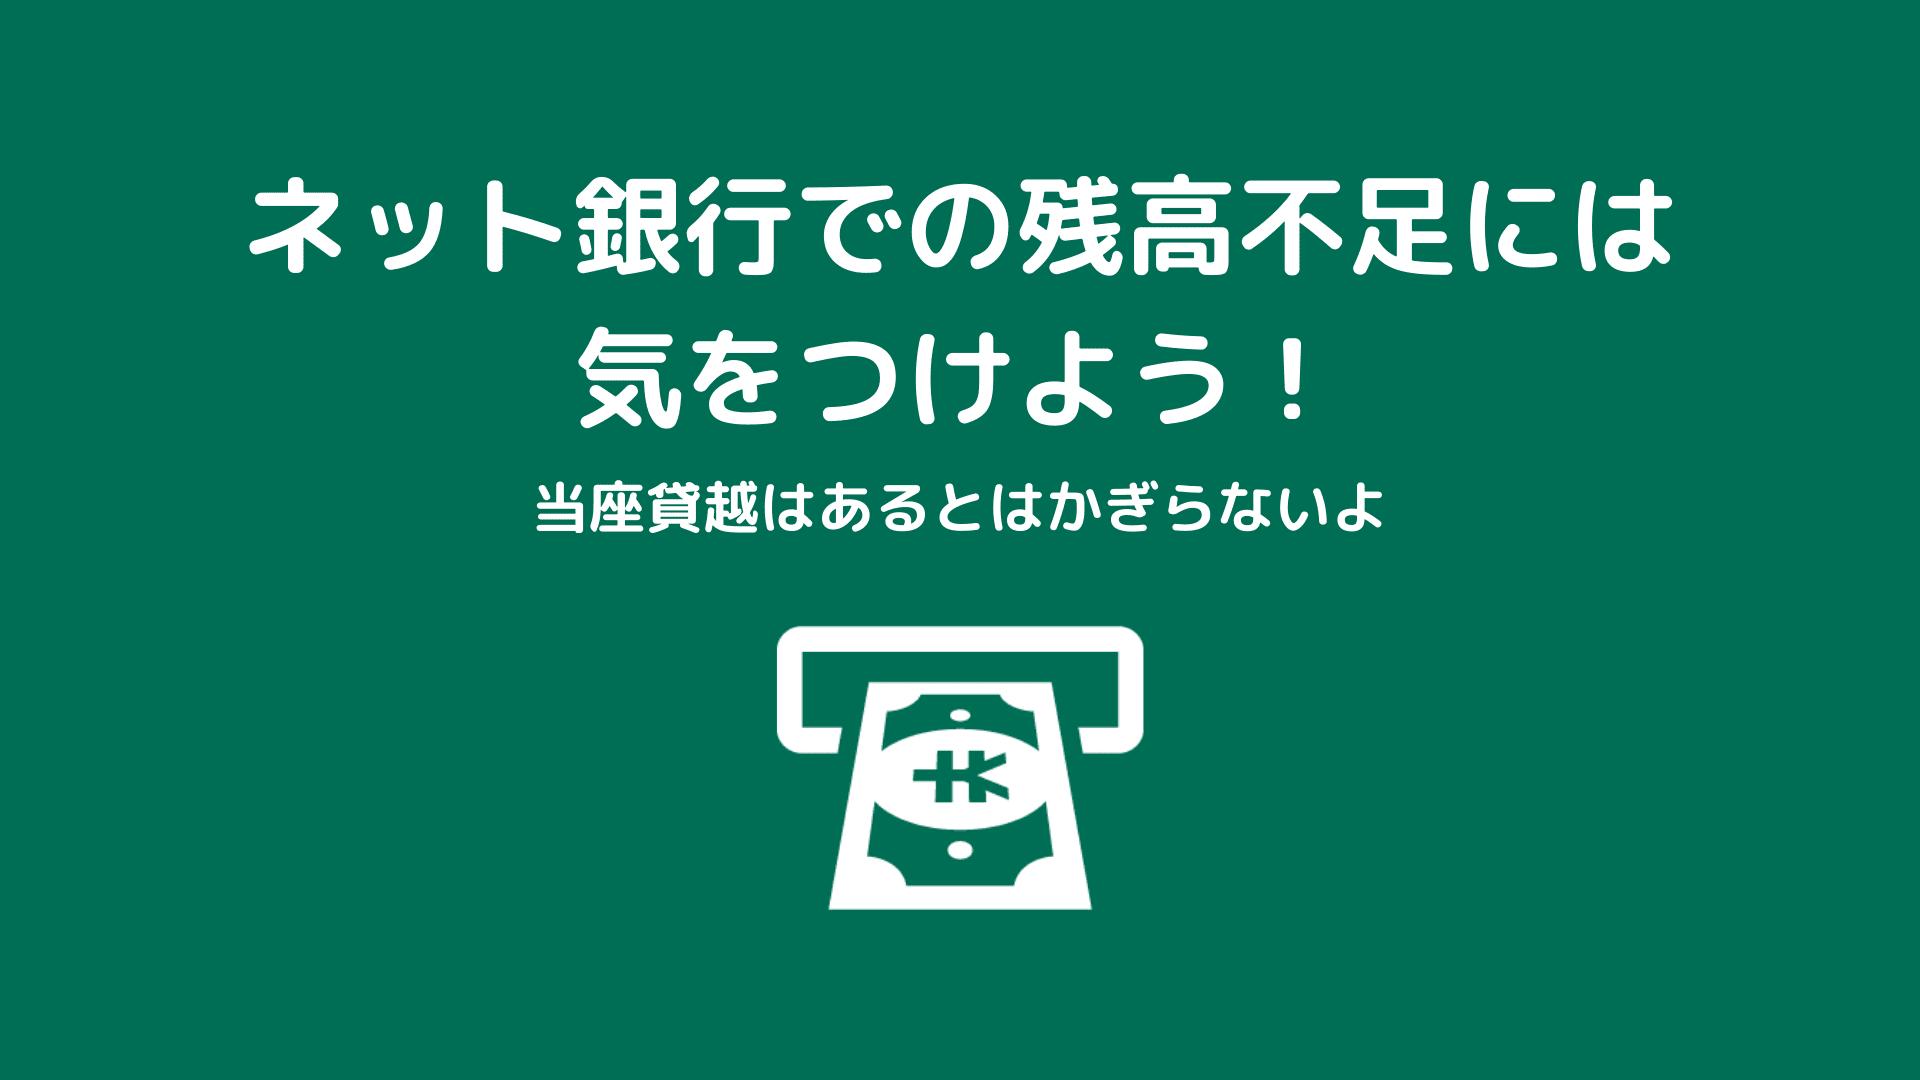 Netbank kashidashi